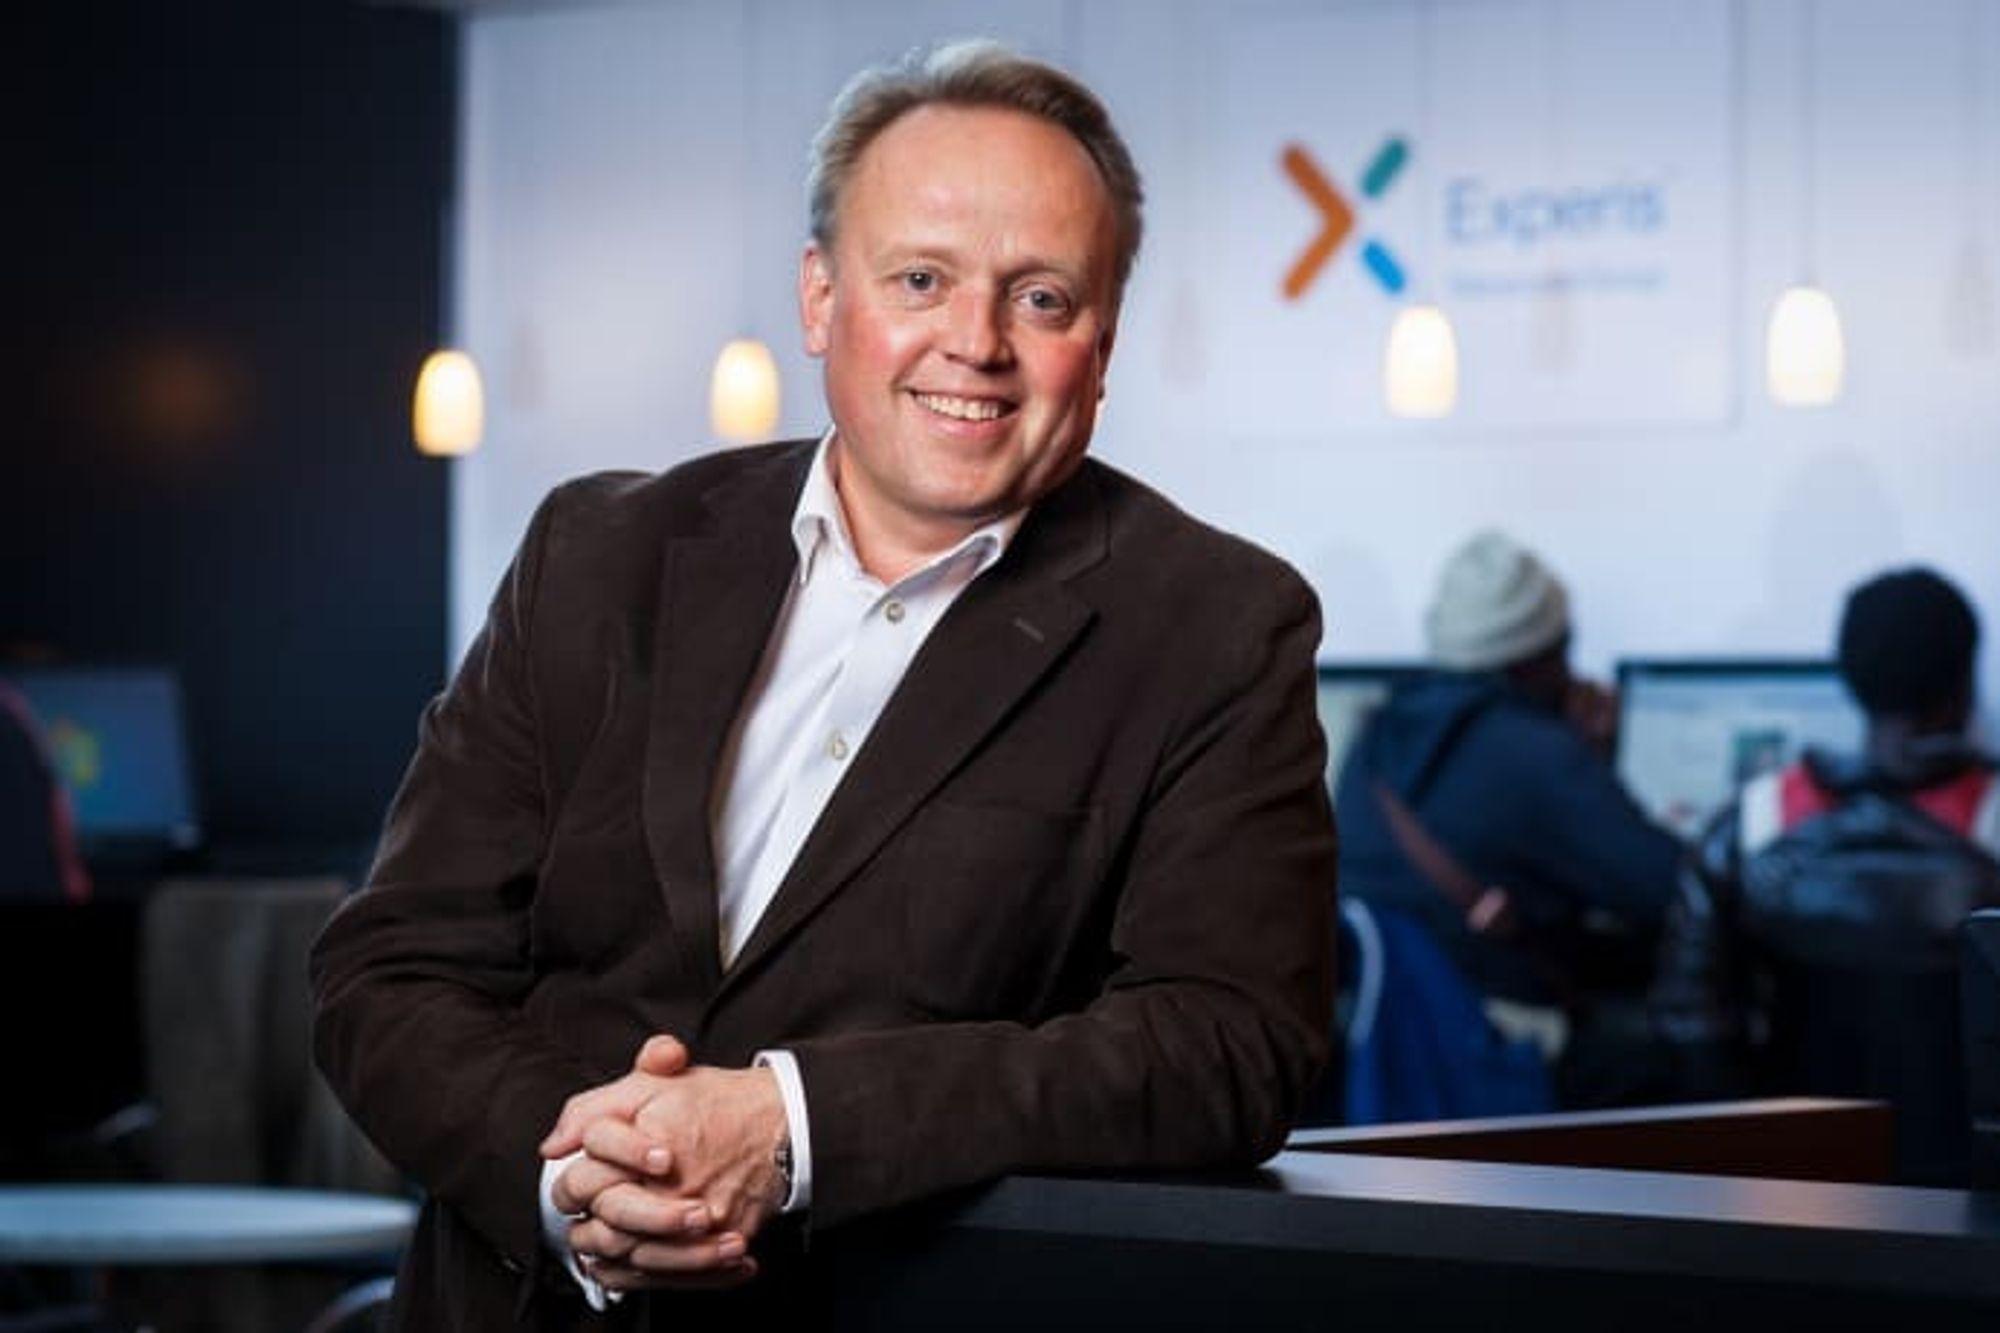 Konserndirektør Trygve Solem i Experis Norge mener jobbmarkedet i Norge for IT-folk er svært godt for tiden.